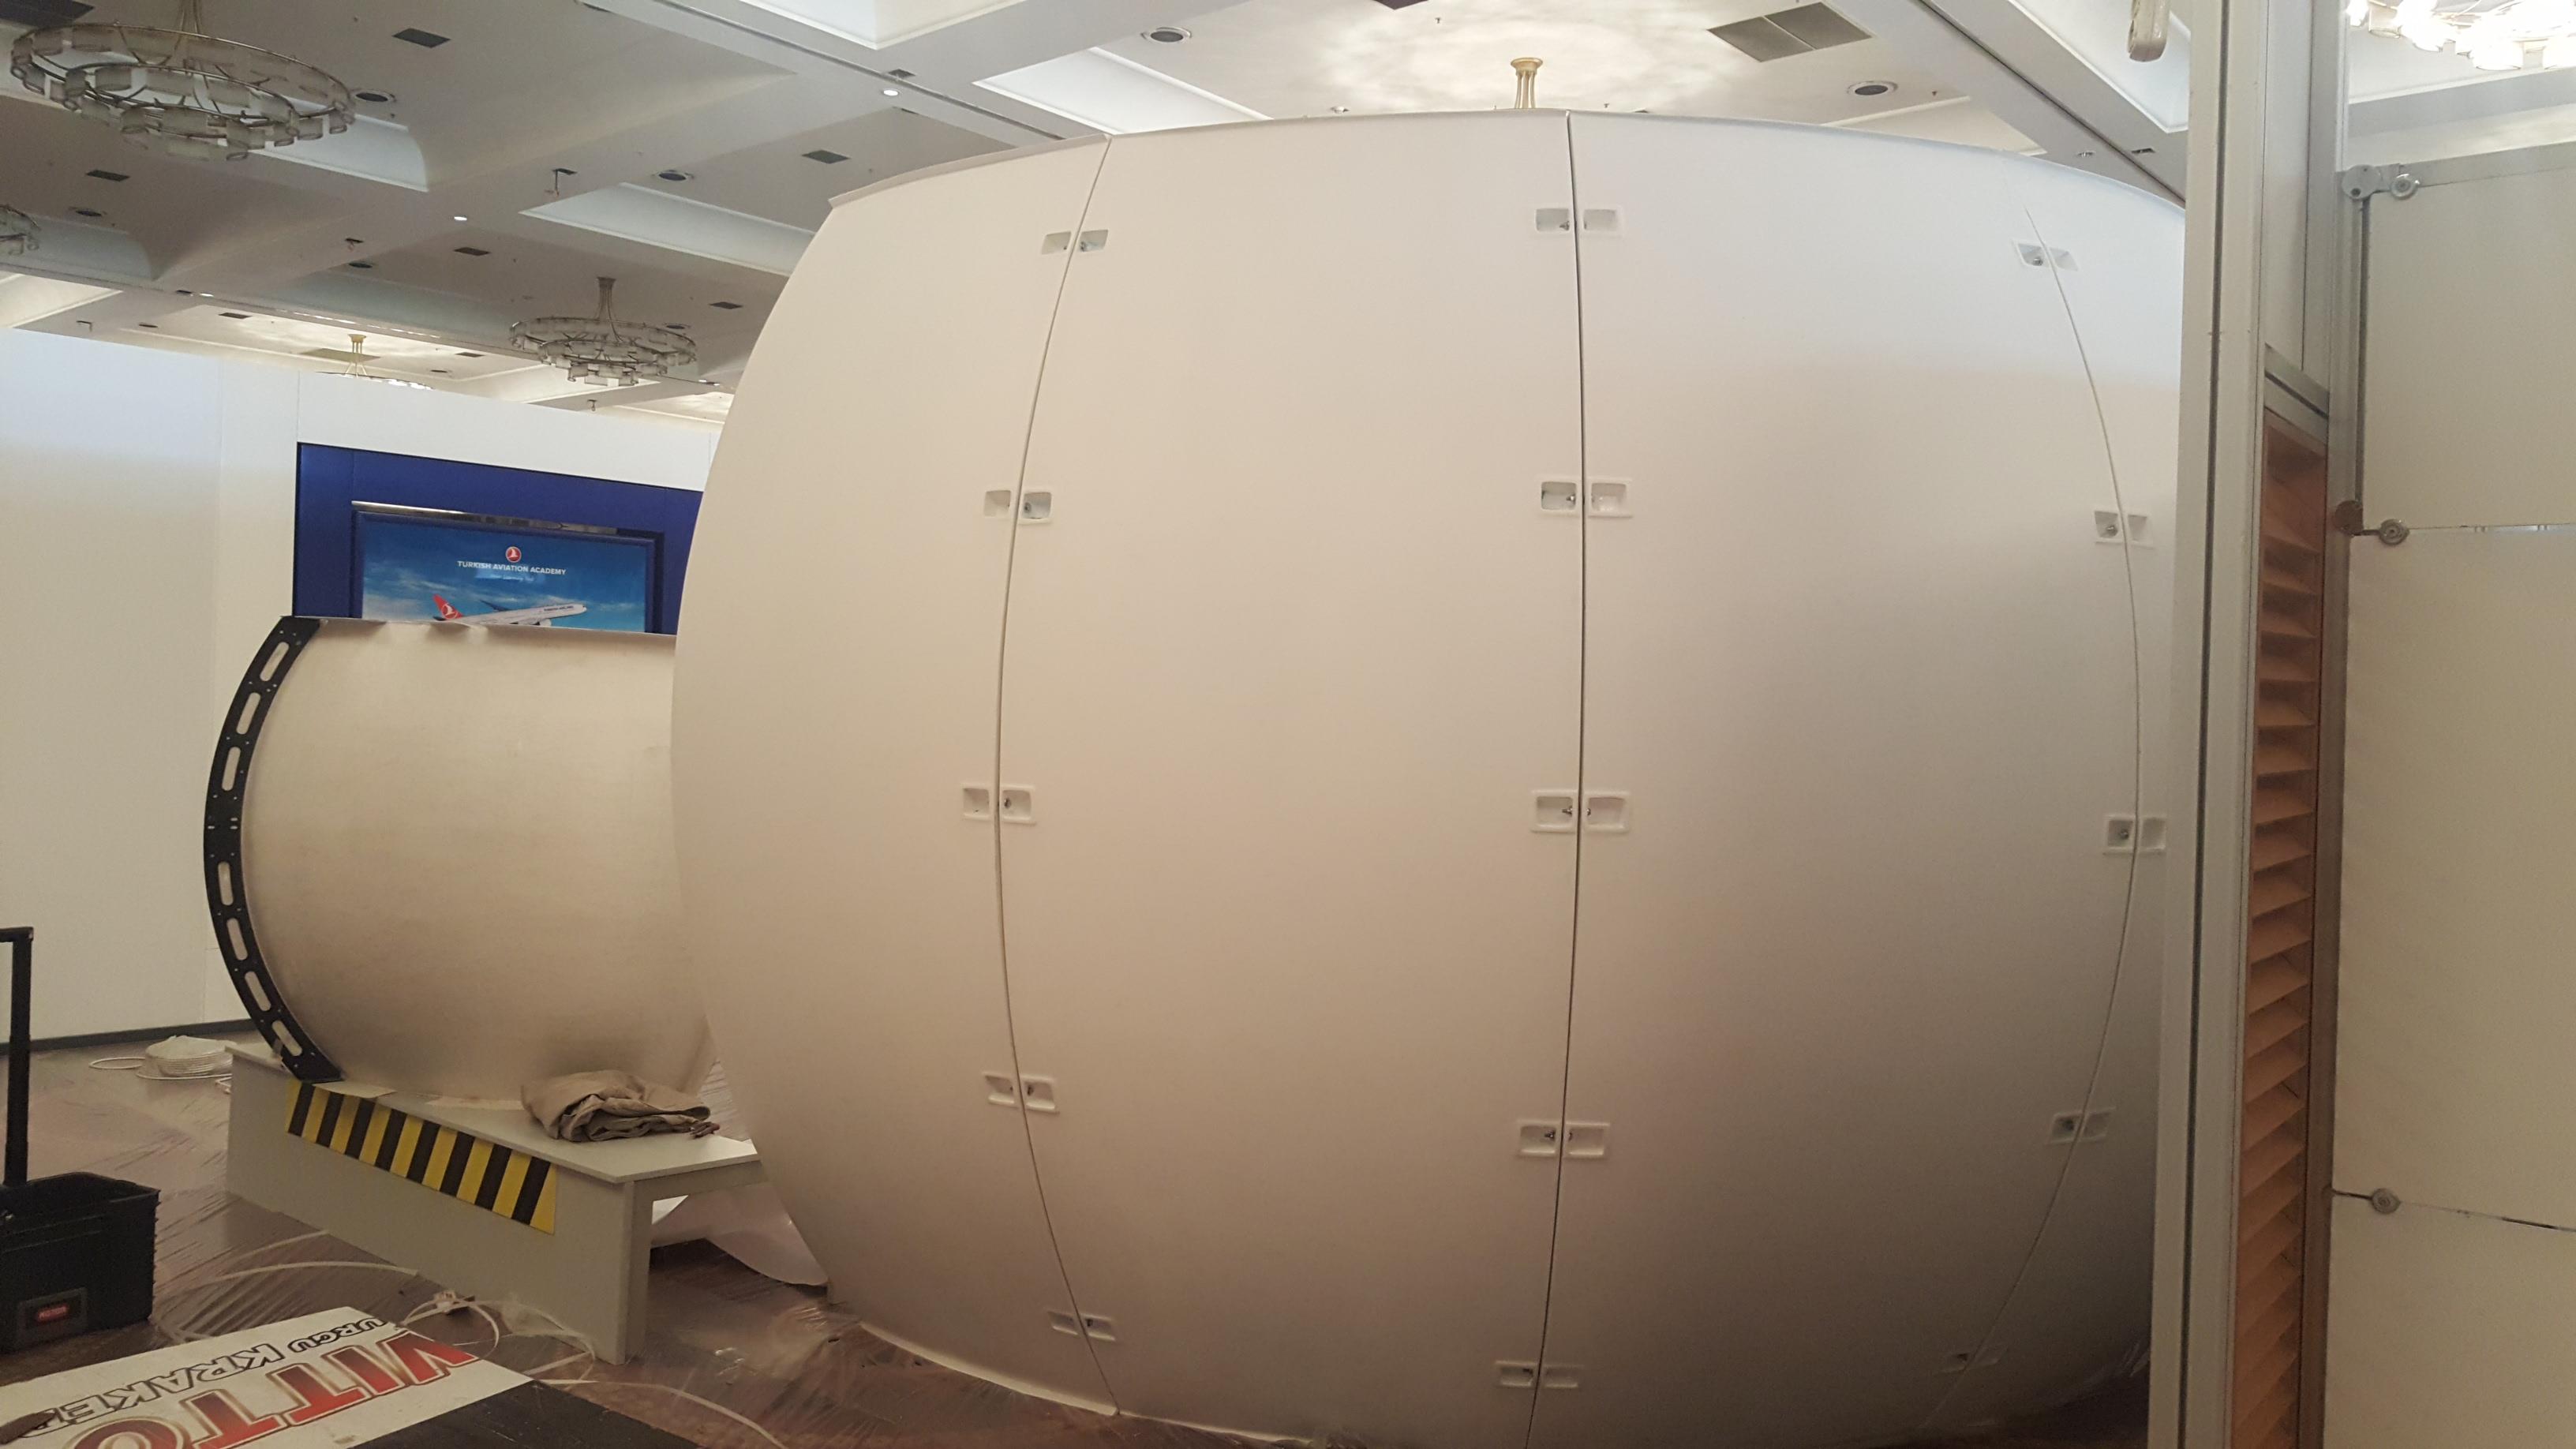 KUPOLS half dome